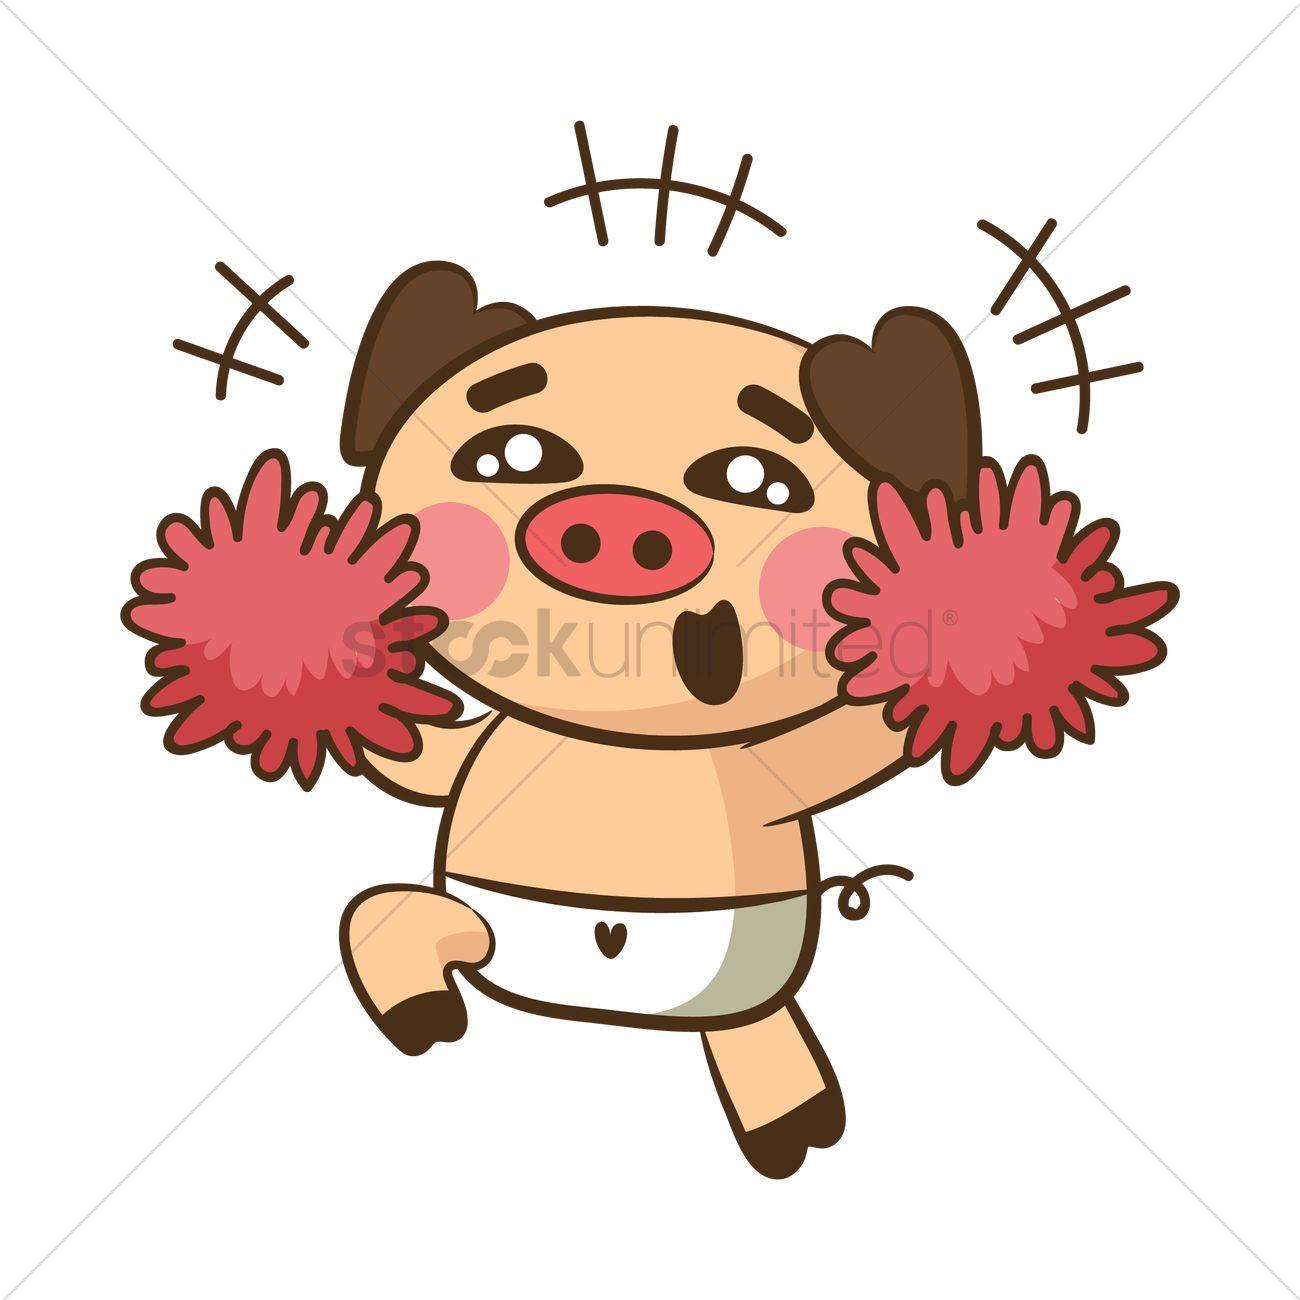 pig character as cheerleader vector image 1954760 stockunlimited